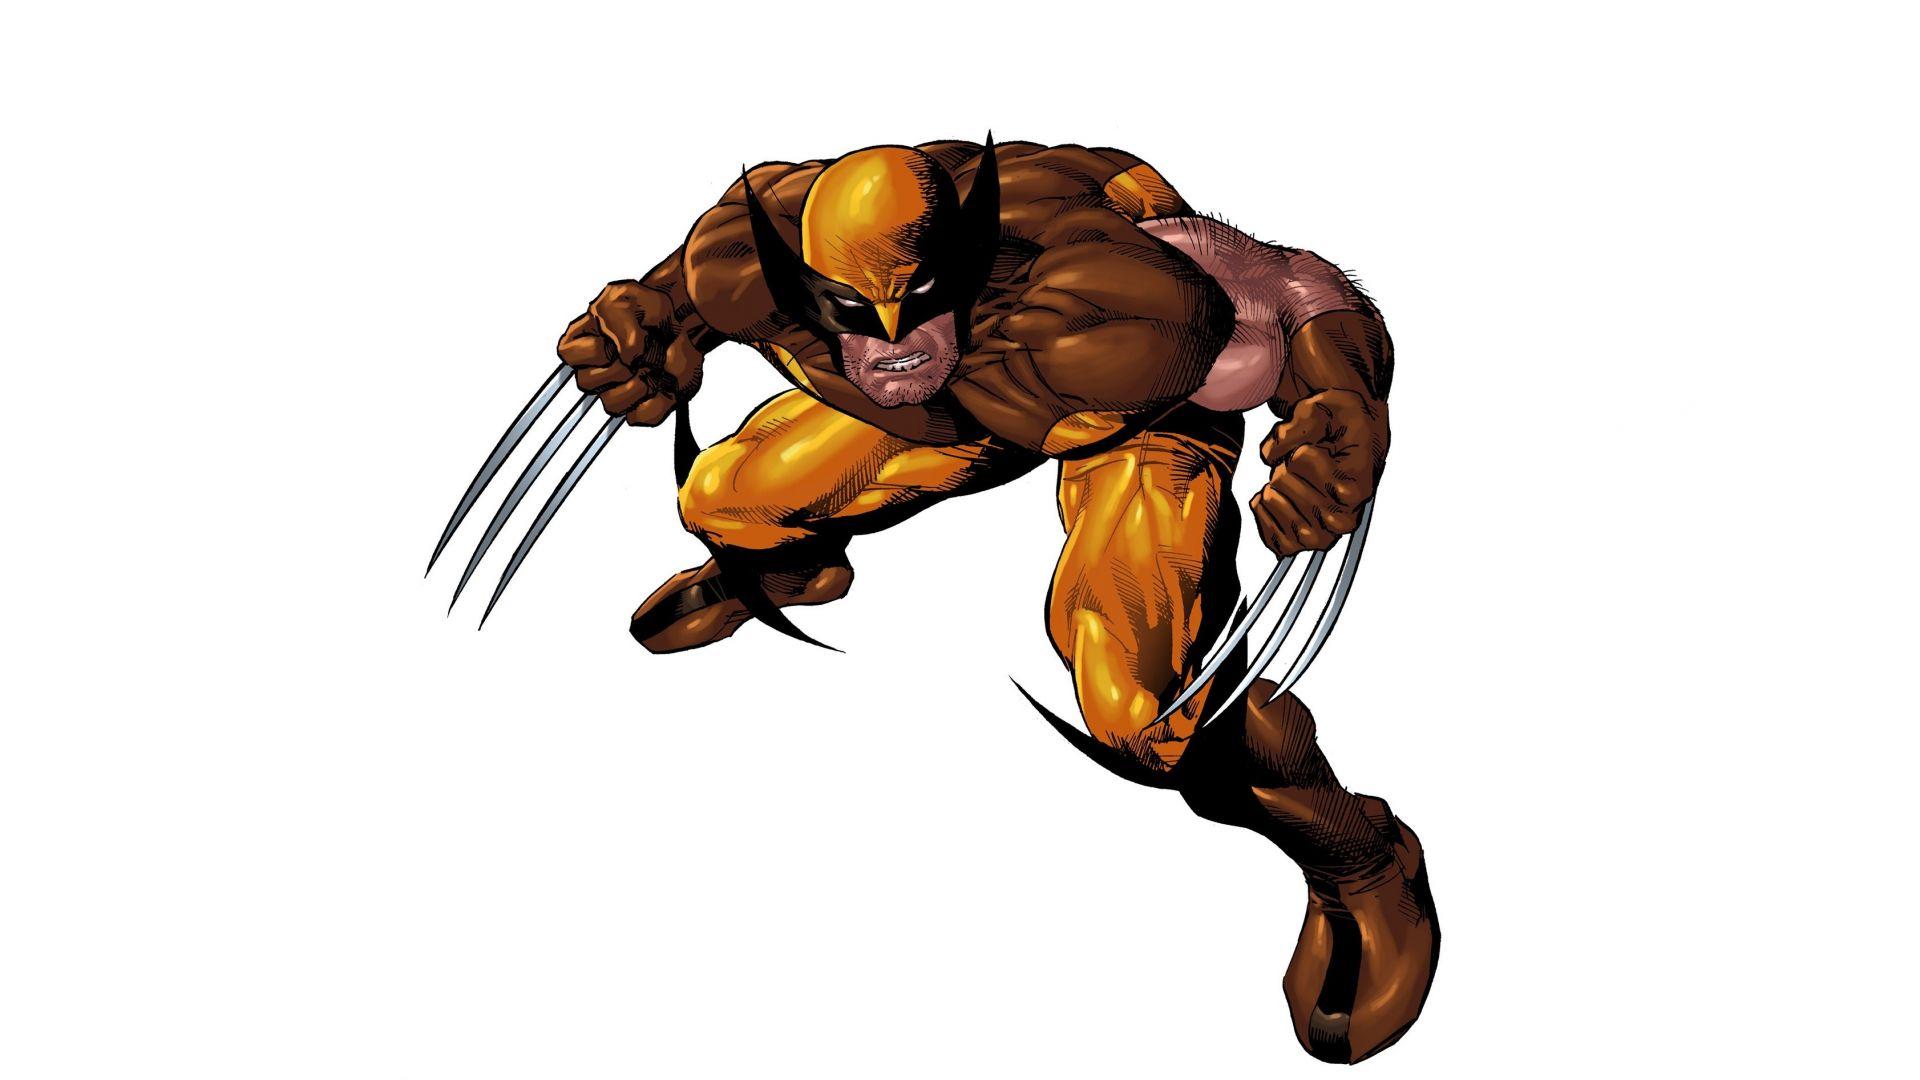 Wallpaper Wolverine, x-men, minimal, superhero